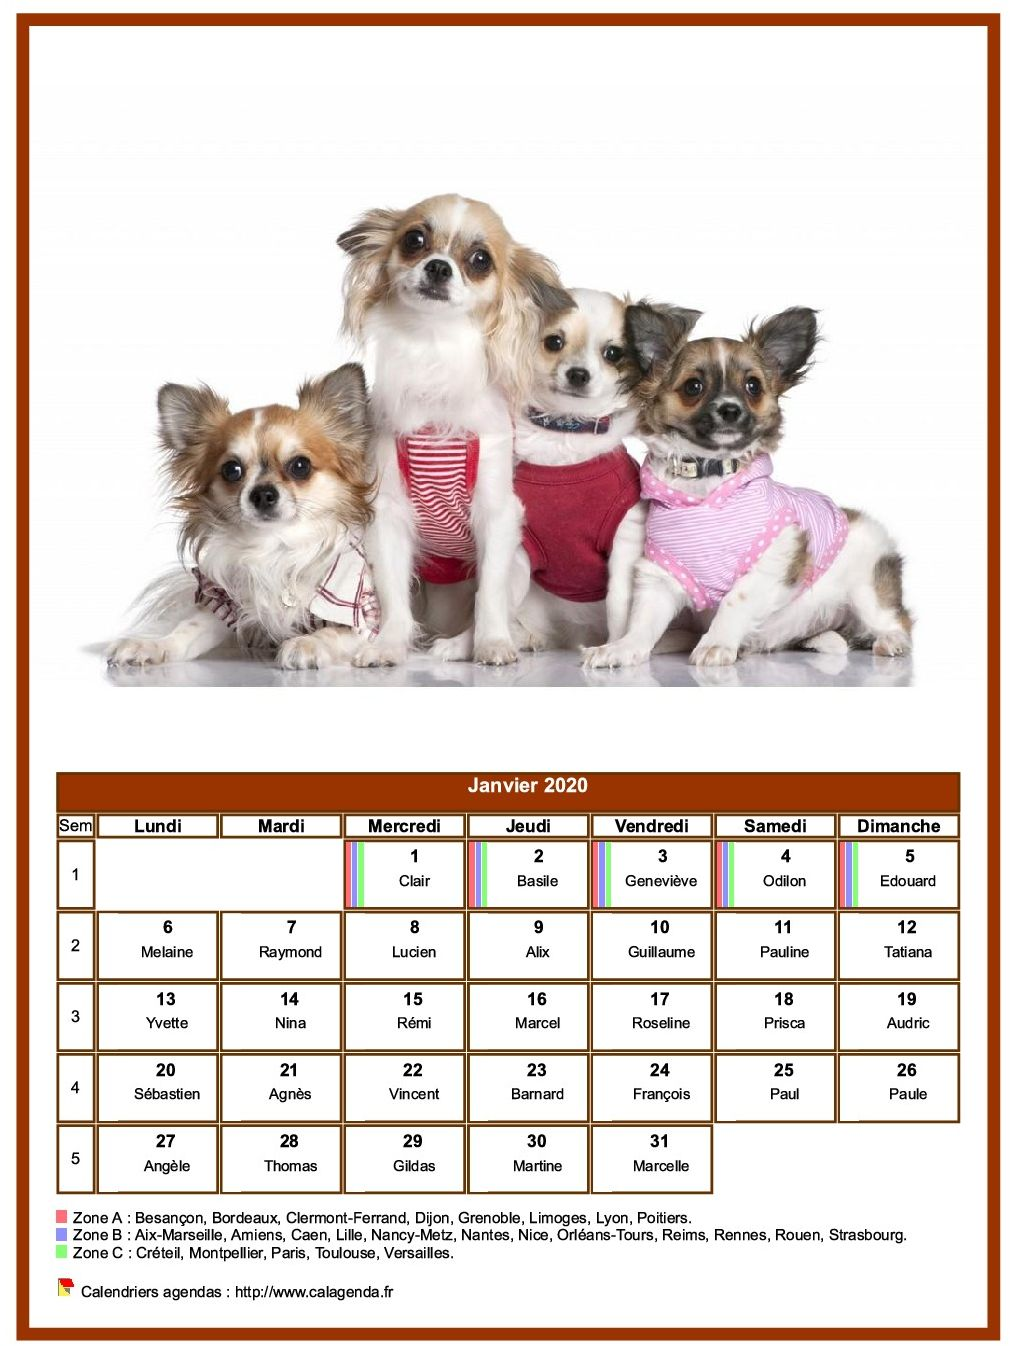 Calendrier janvier 2020 chiens